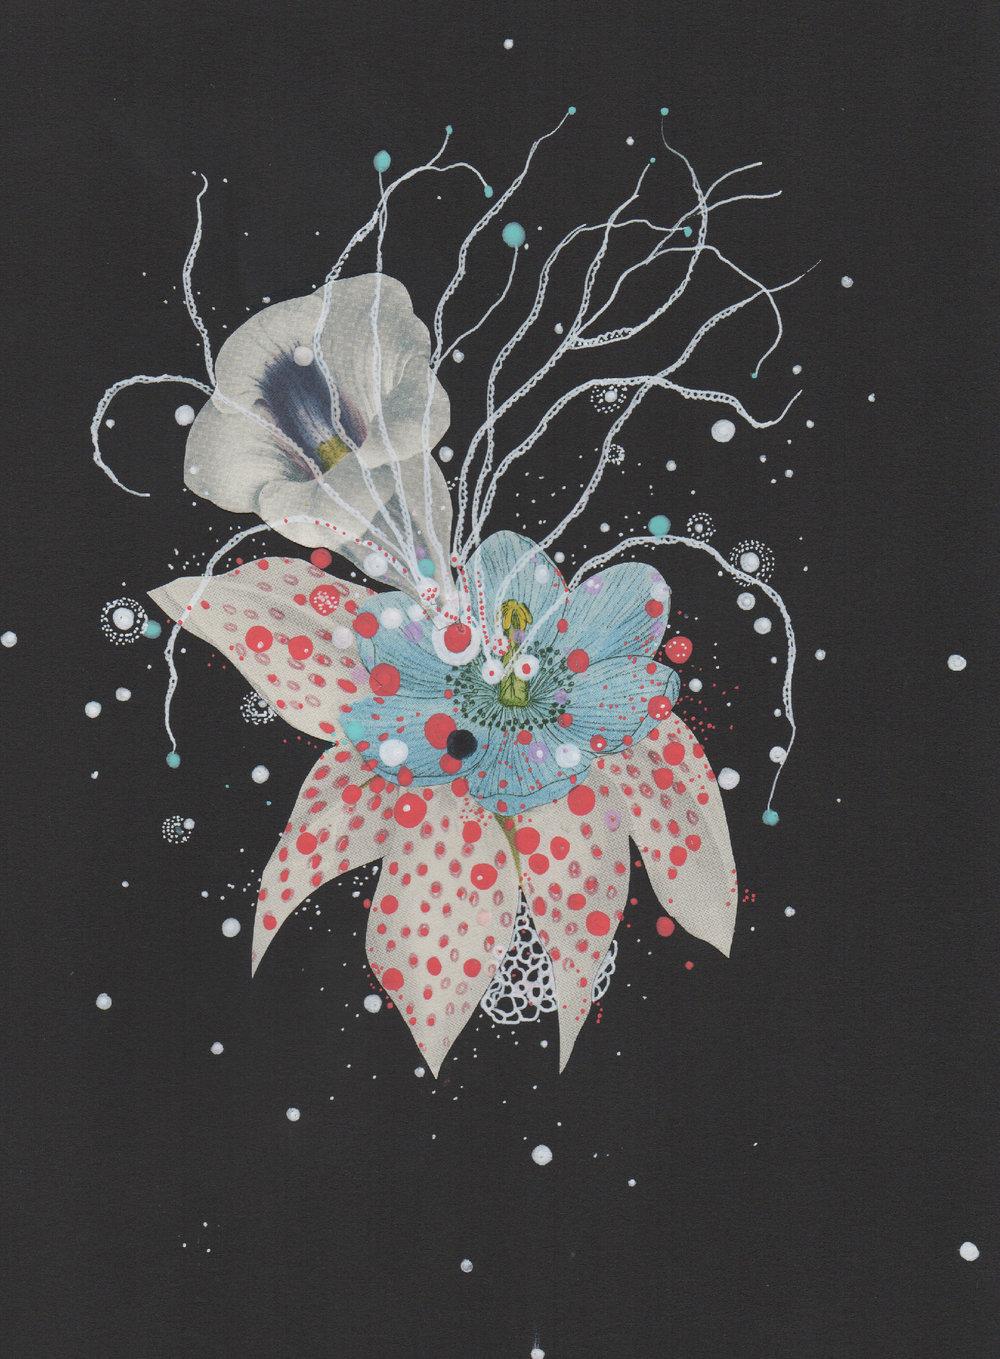 sparklingcelestialanemone.jpg